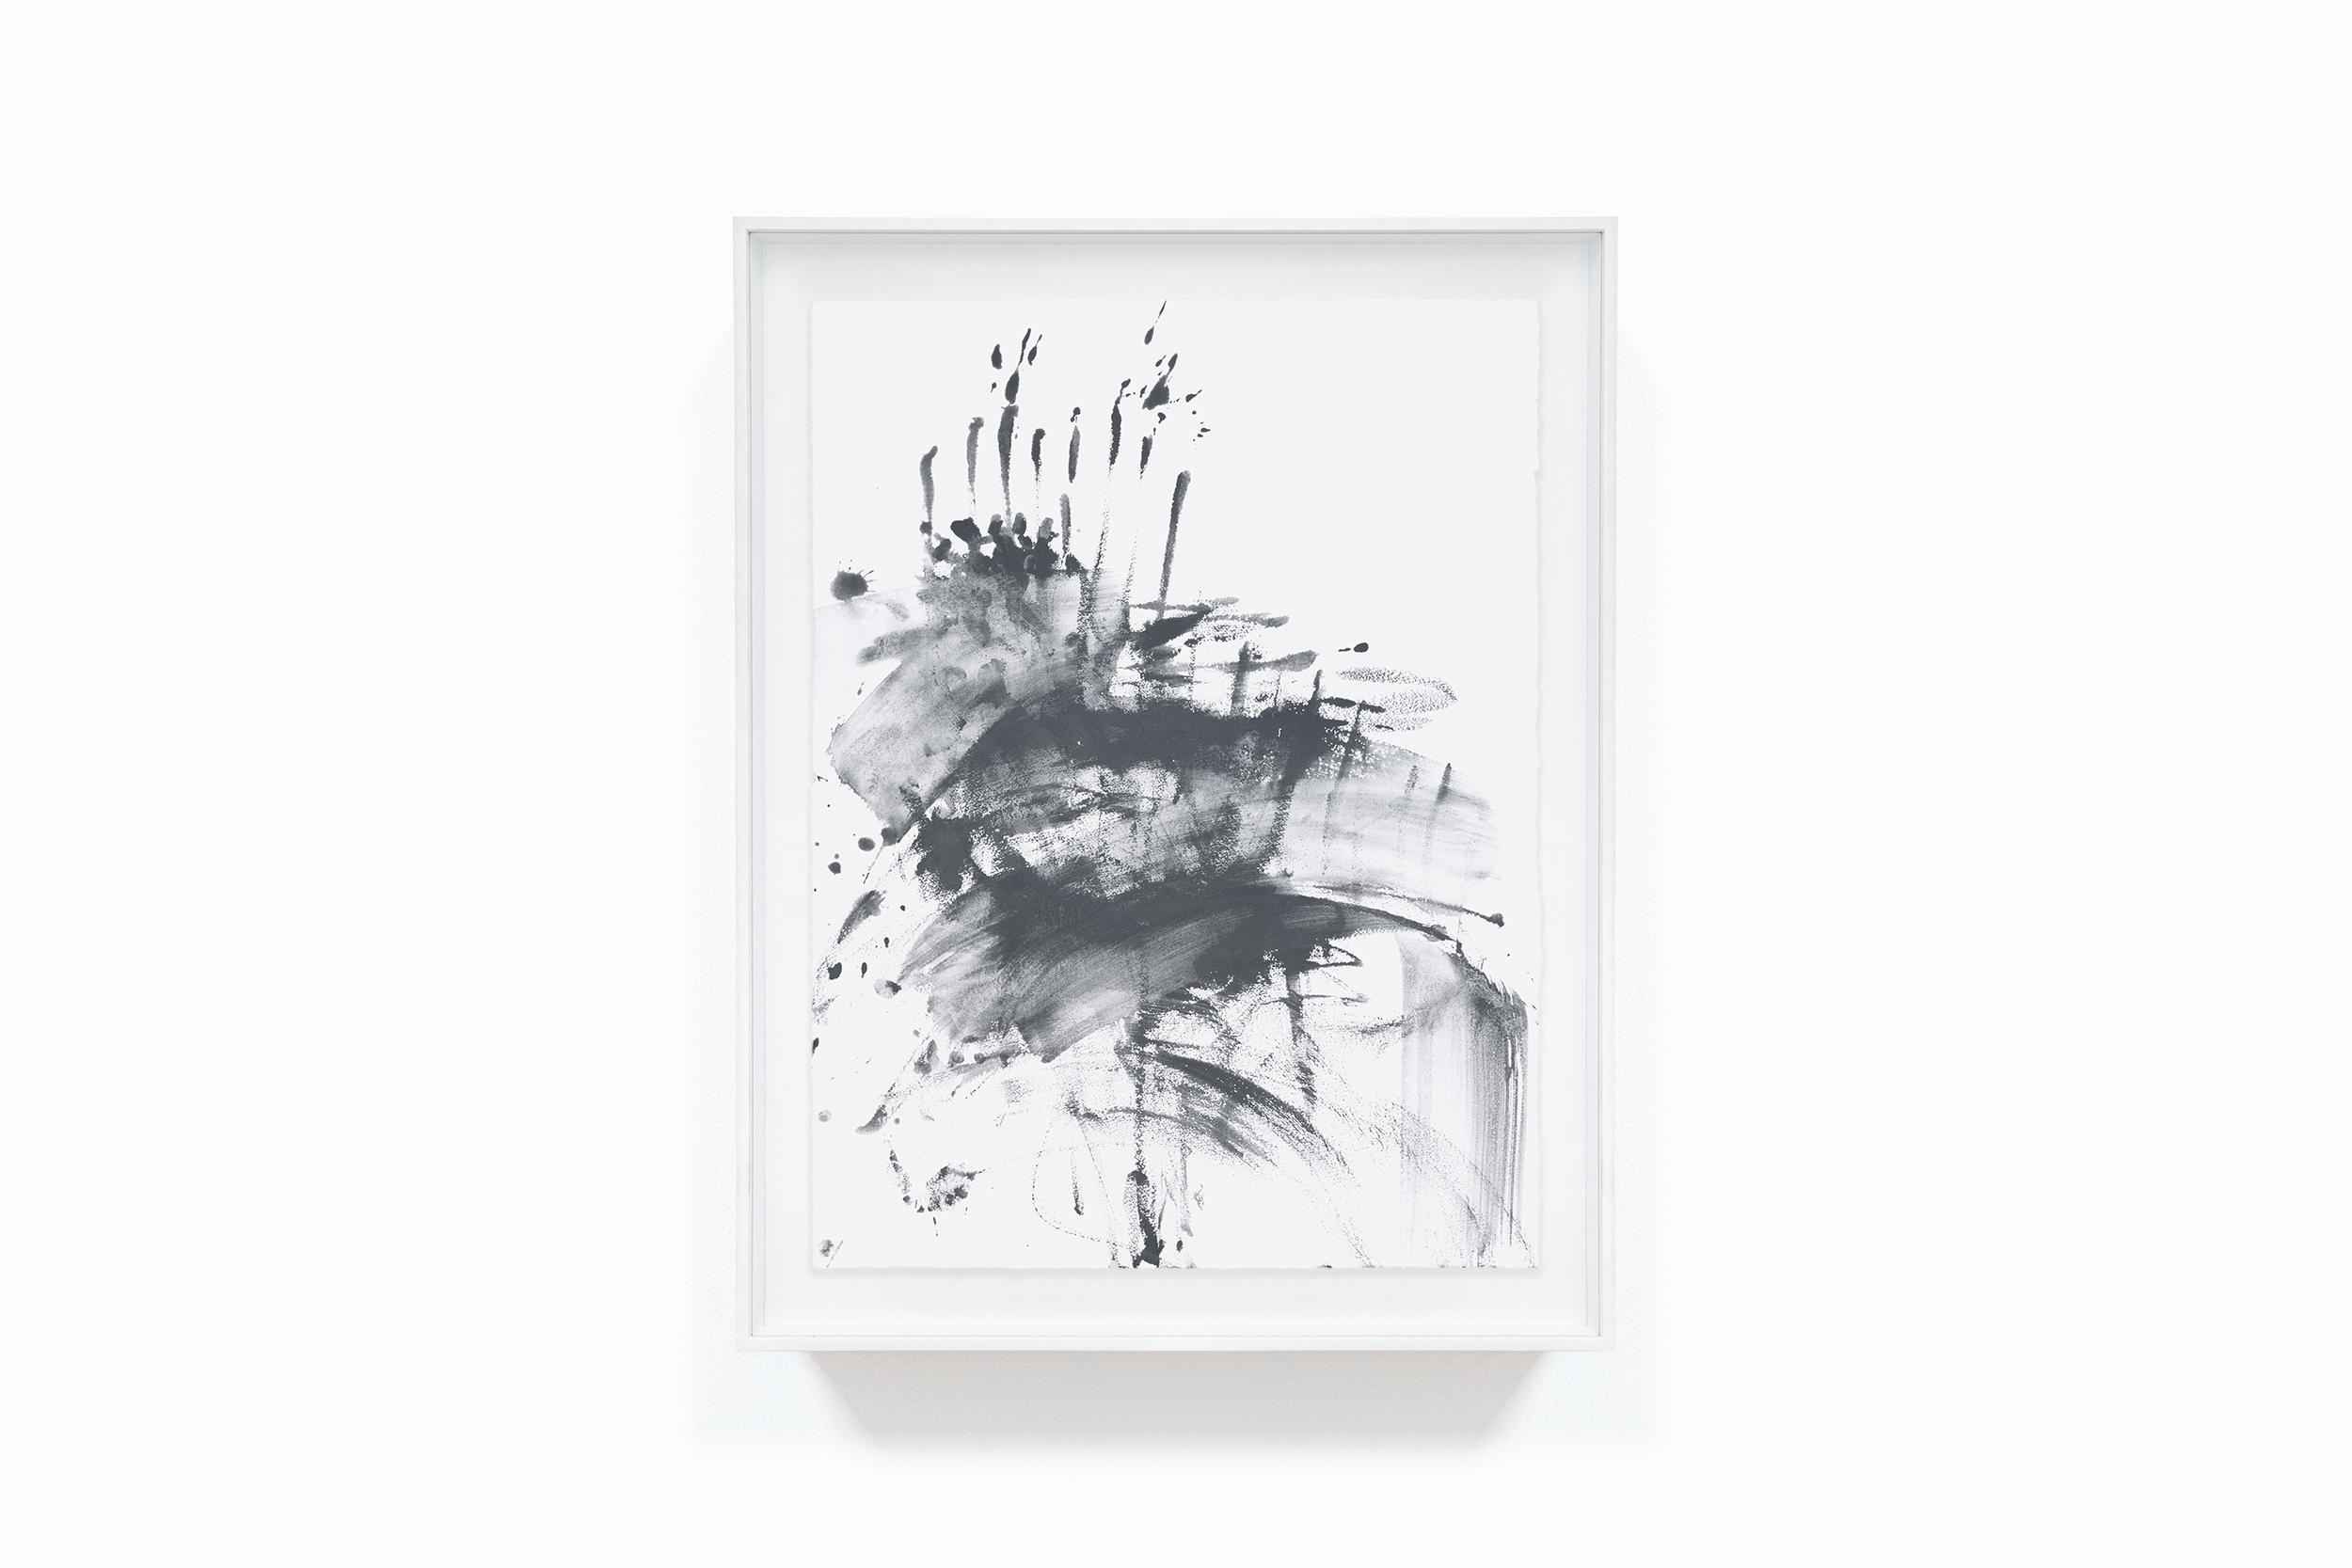 088 Andre Gigante Pintura Painting bonjourmolotov La.jpg